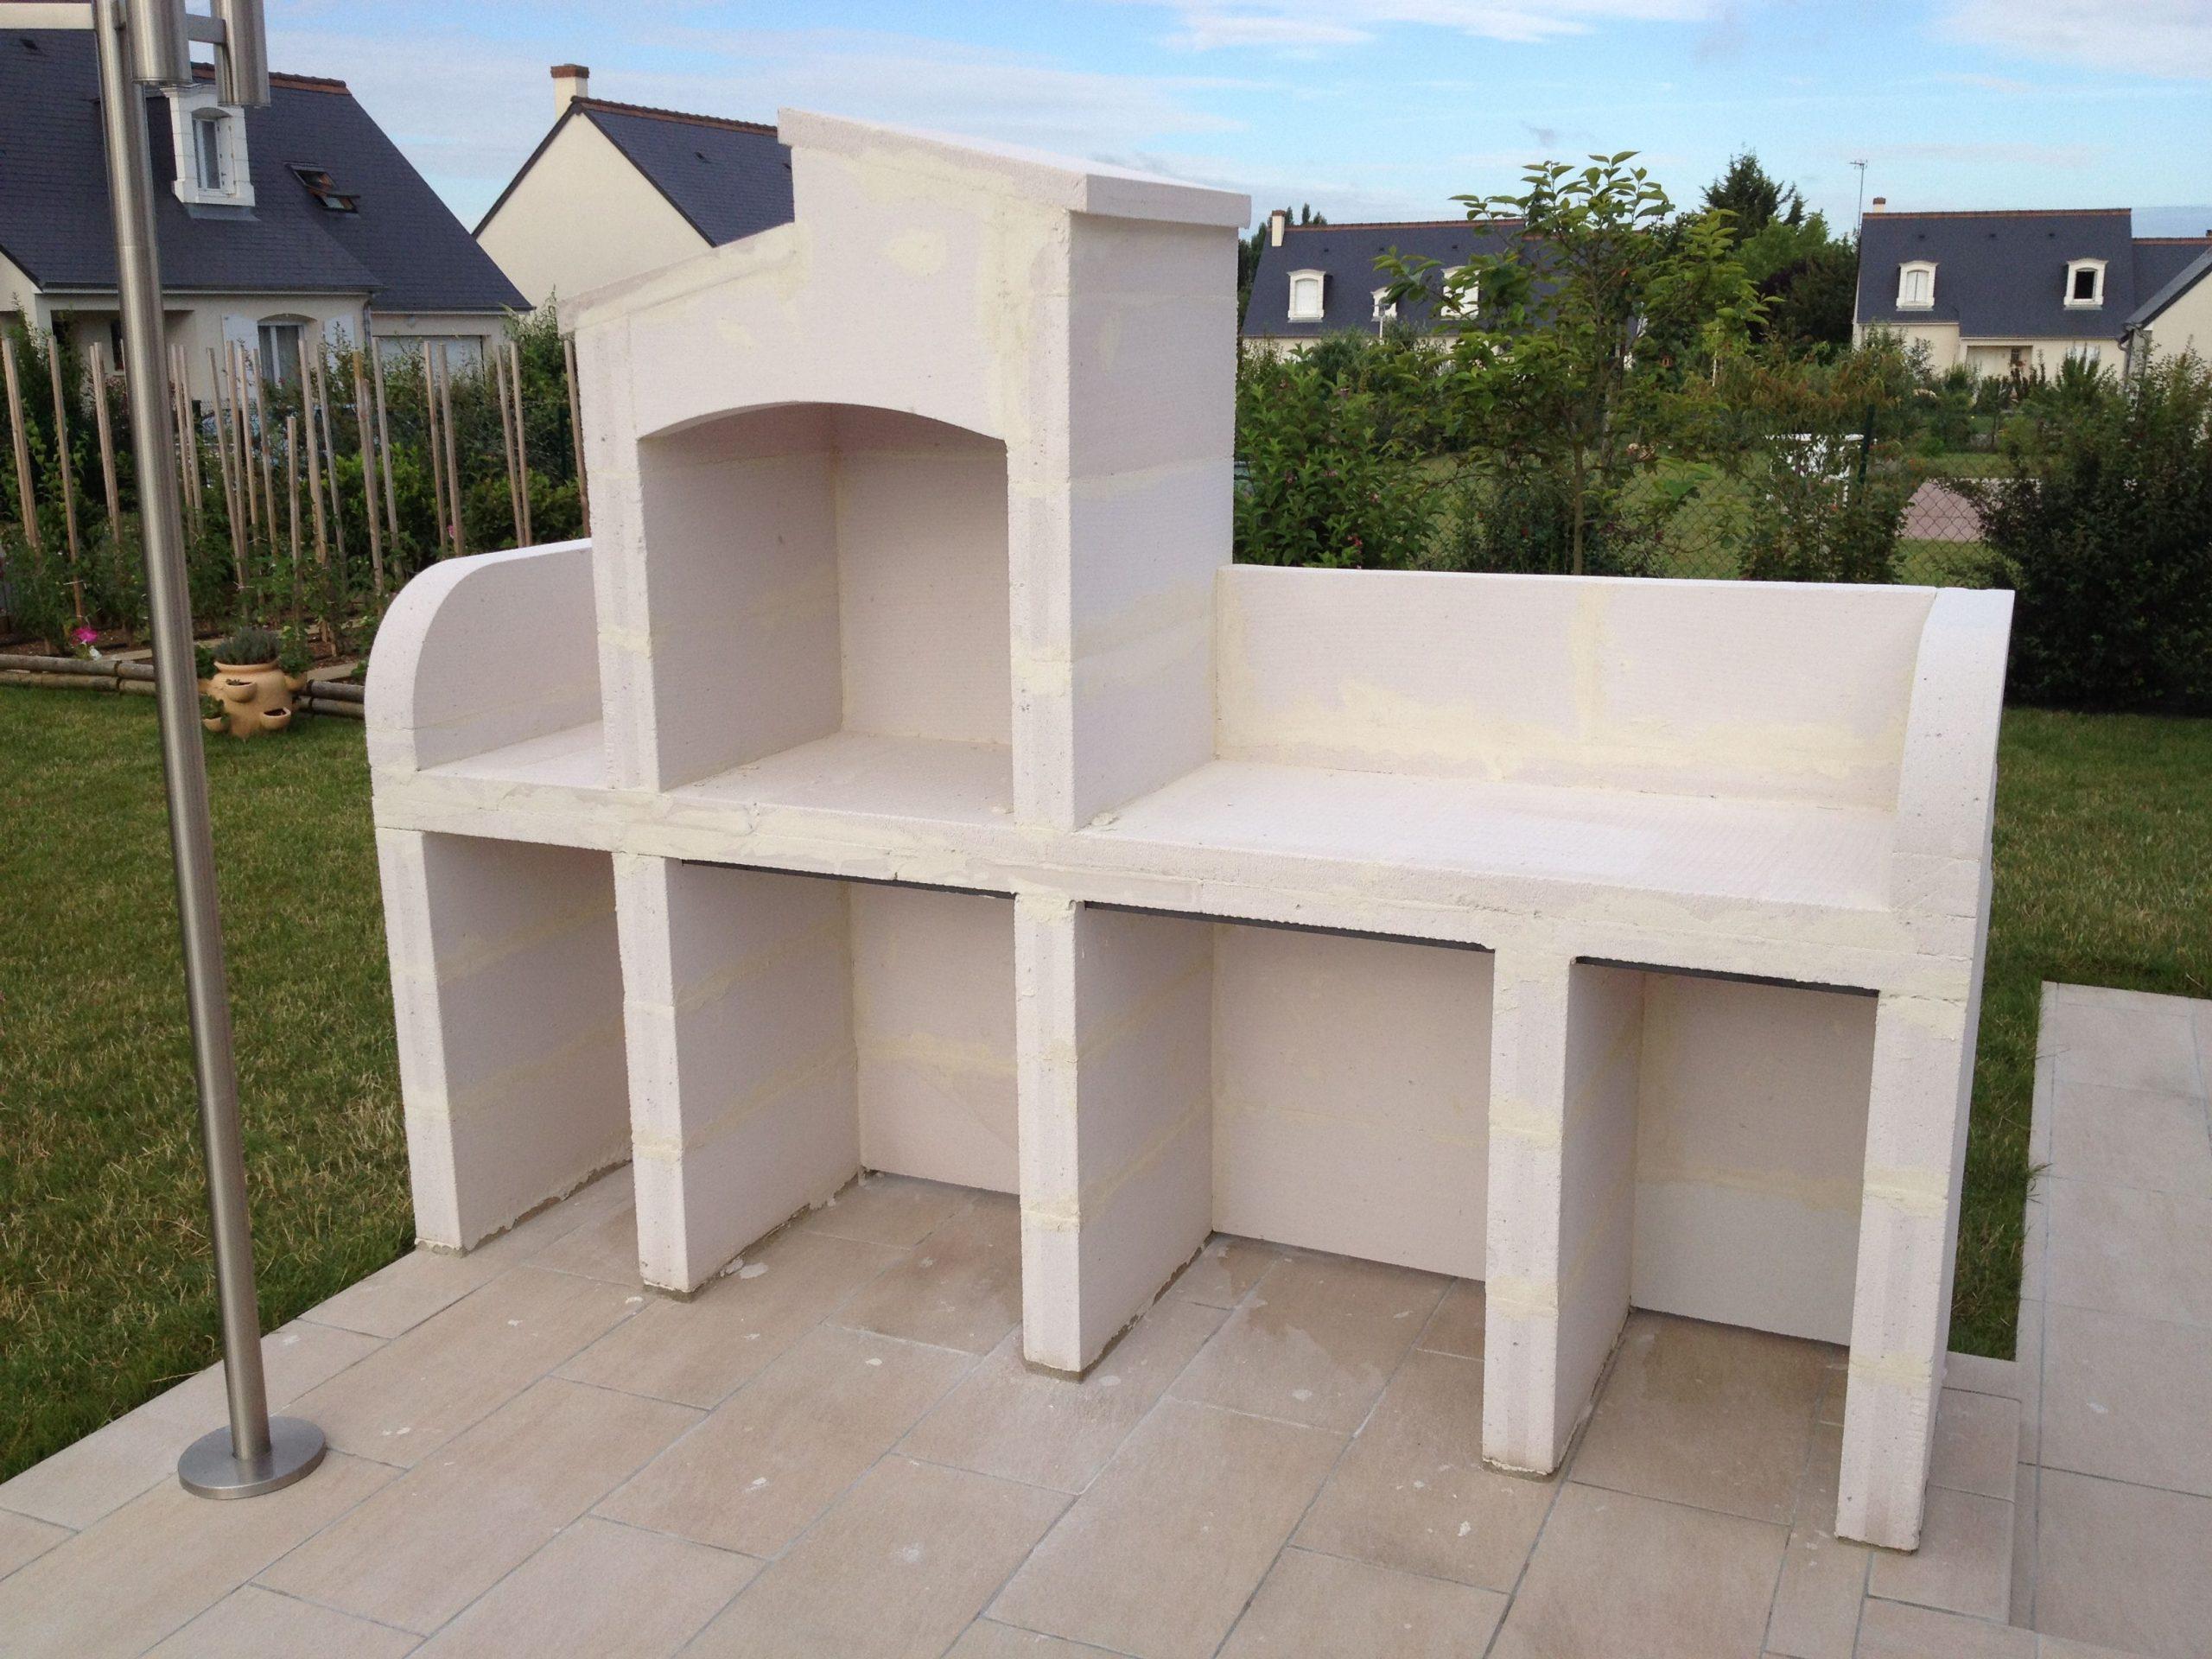 Barbecue Extérieur | Construire Un Barbecue, Barbecue En ... intérieur Abri De Jardin En Beton Cellulaire